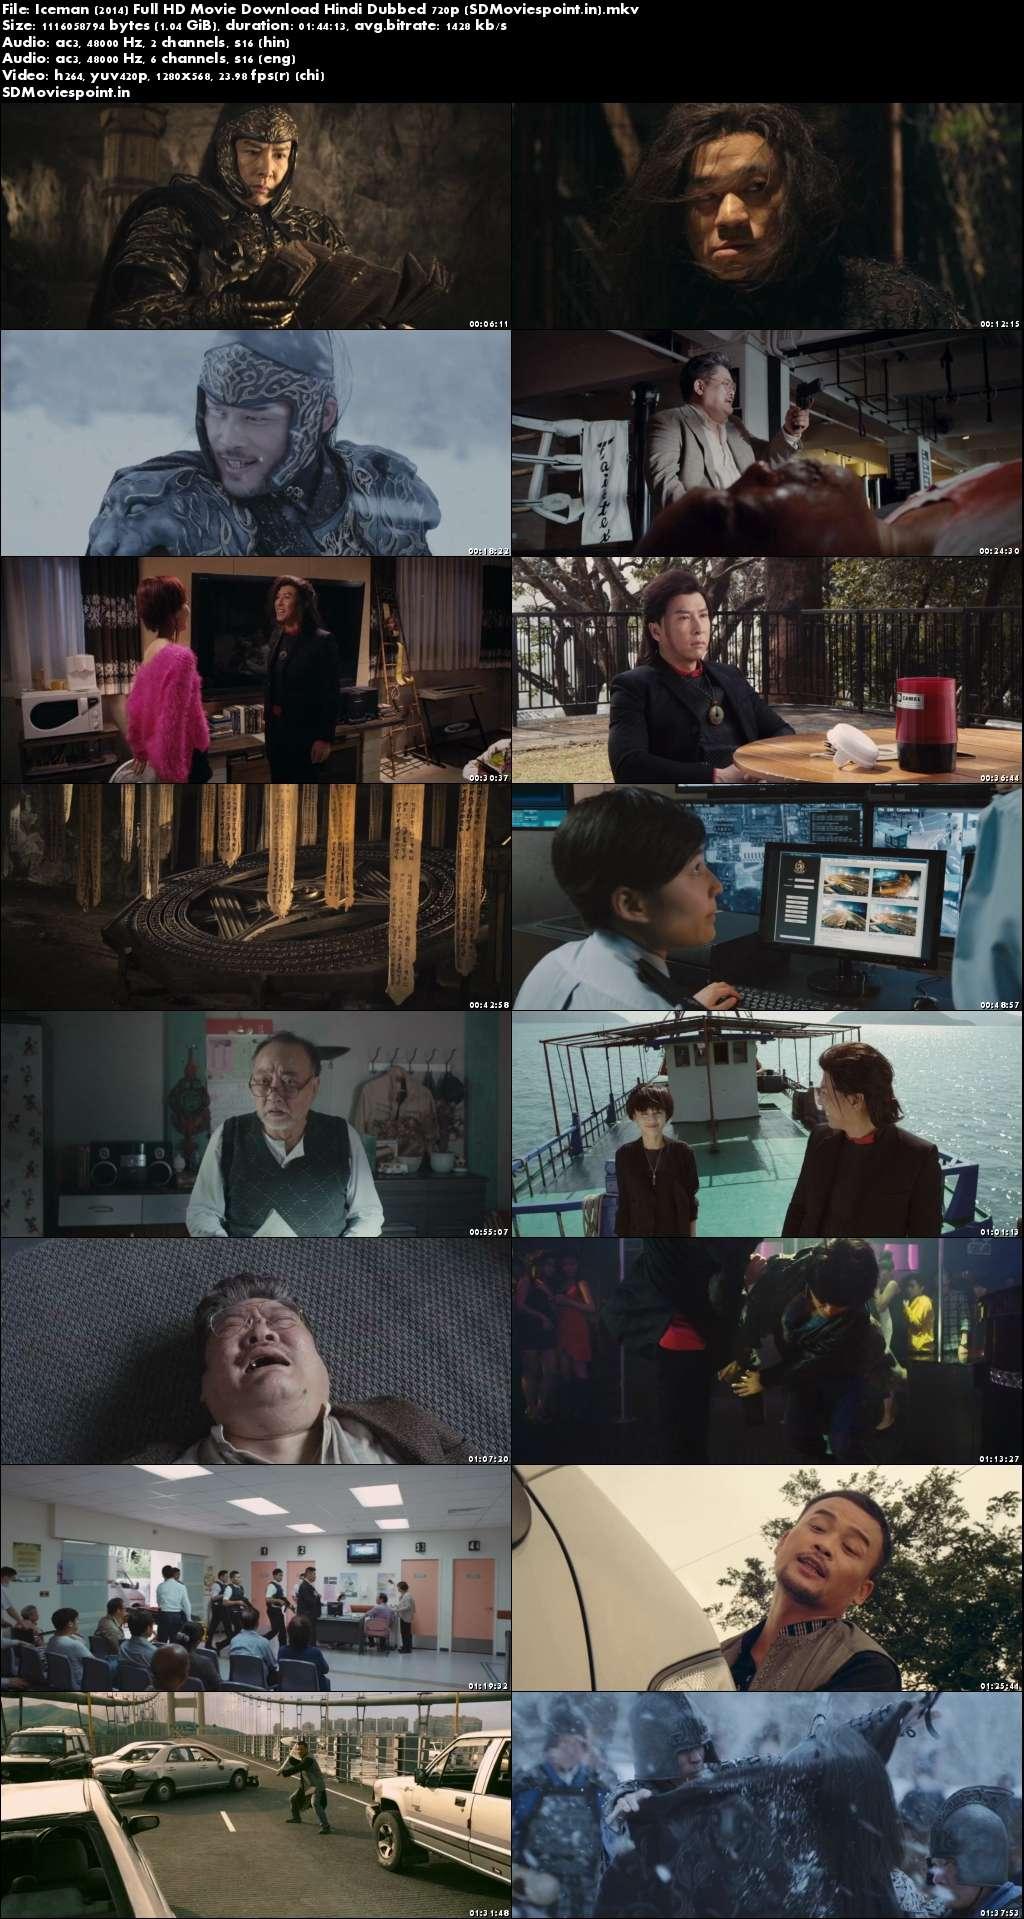 Screen Shot Iceman (2014) Full HD Movie Download Hindi Dubbed 720p